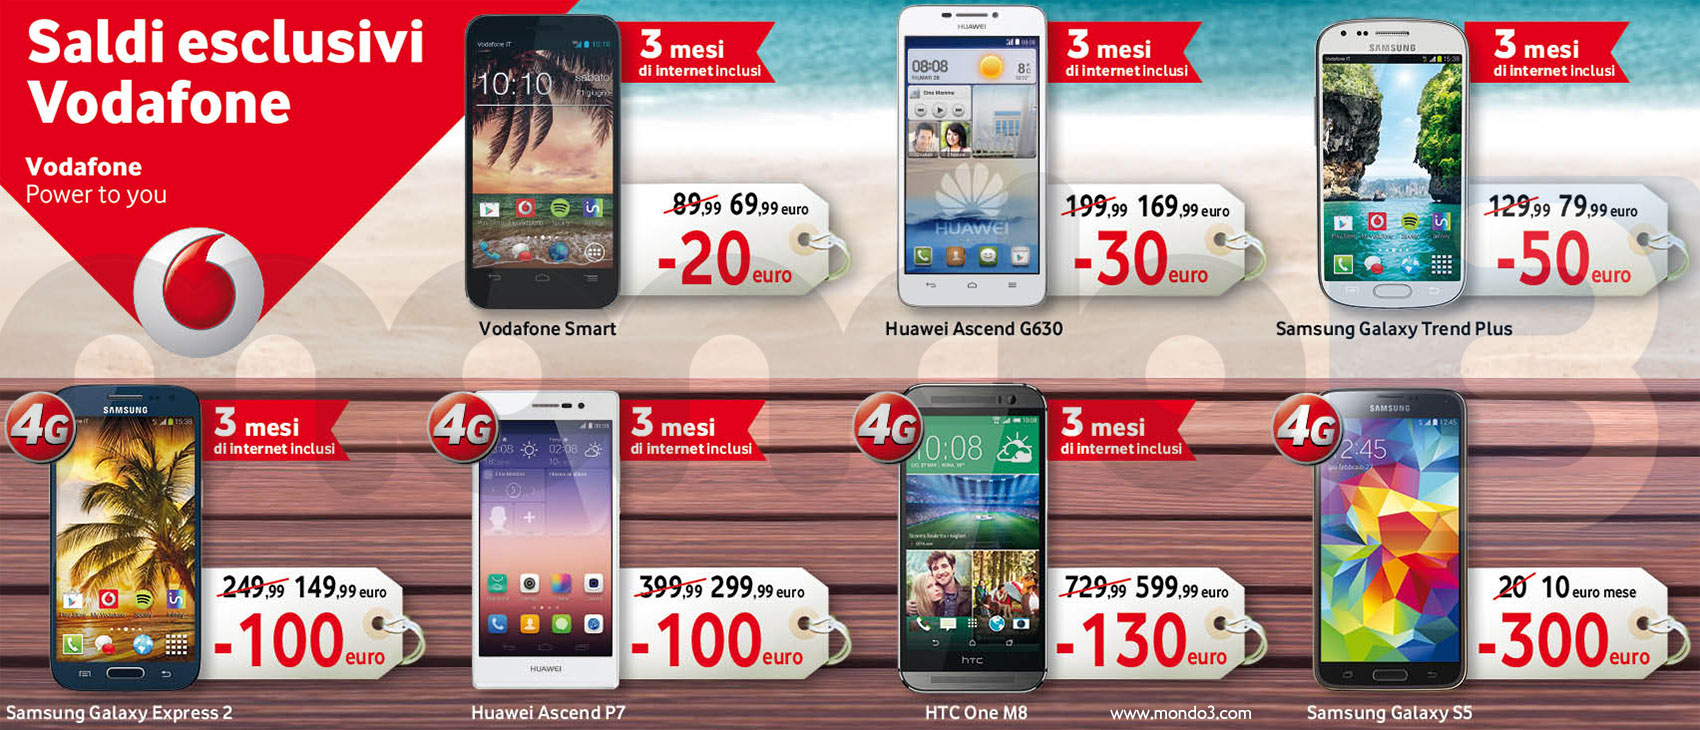 Saldi Esclusivi Vodafone 2014 (Mondo3)